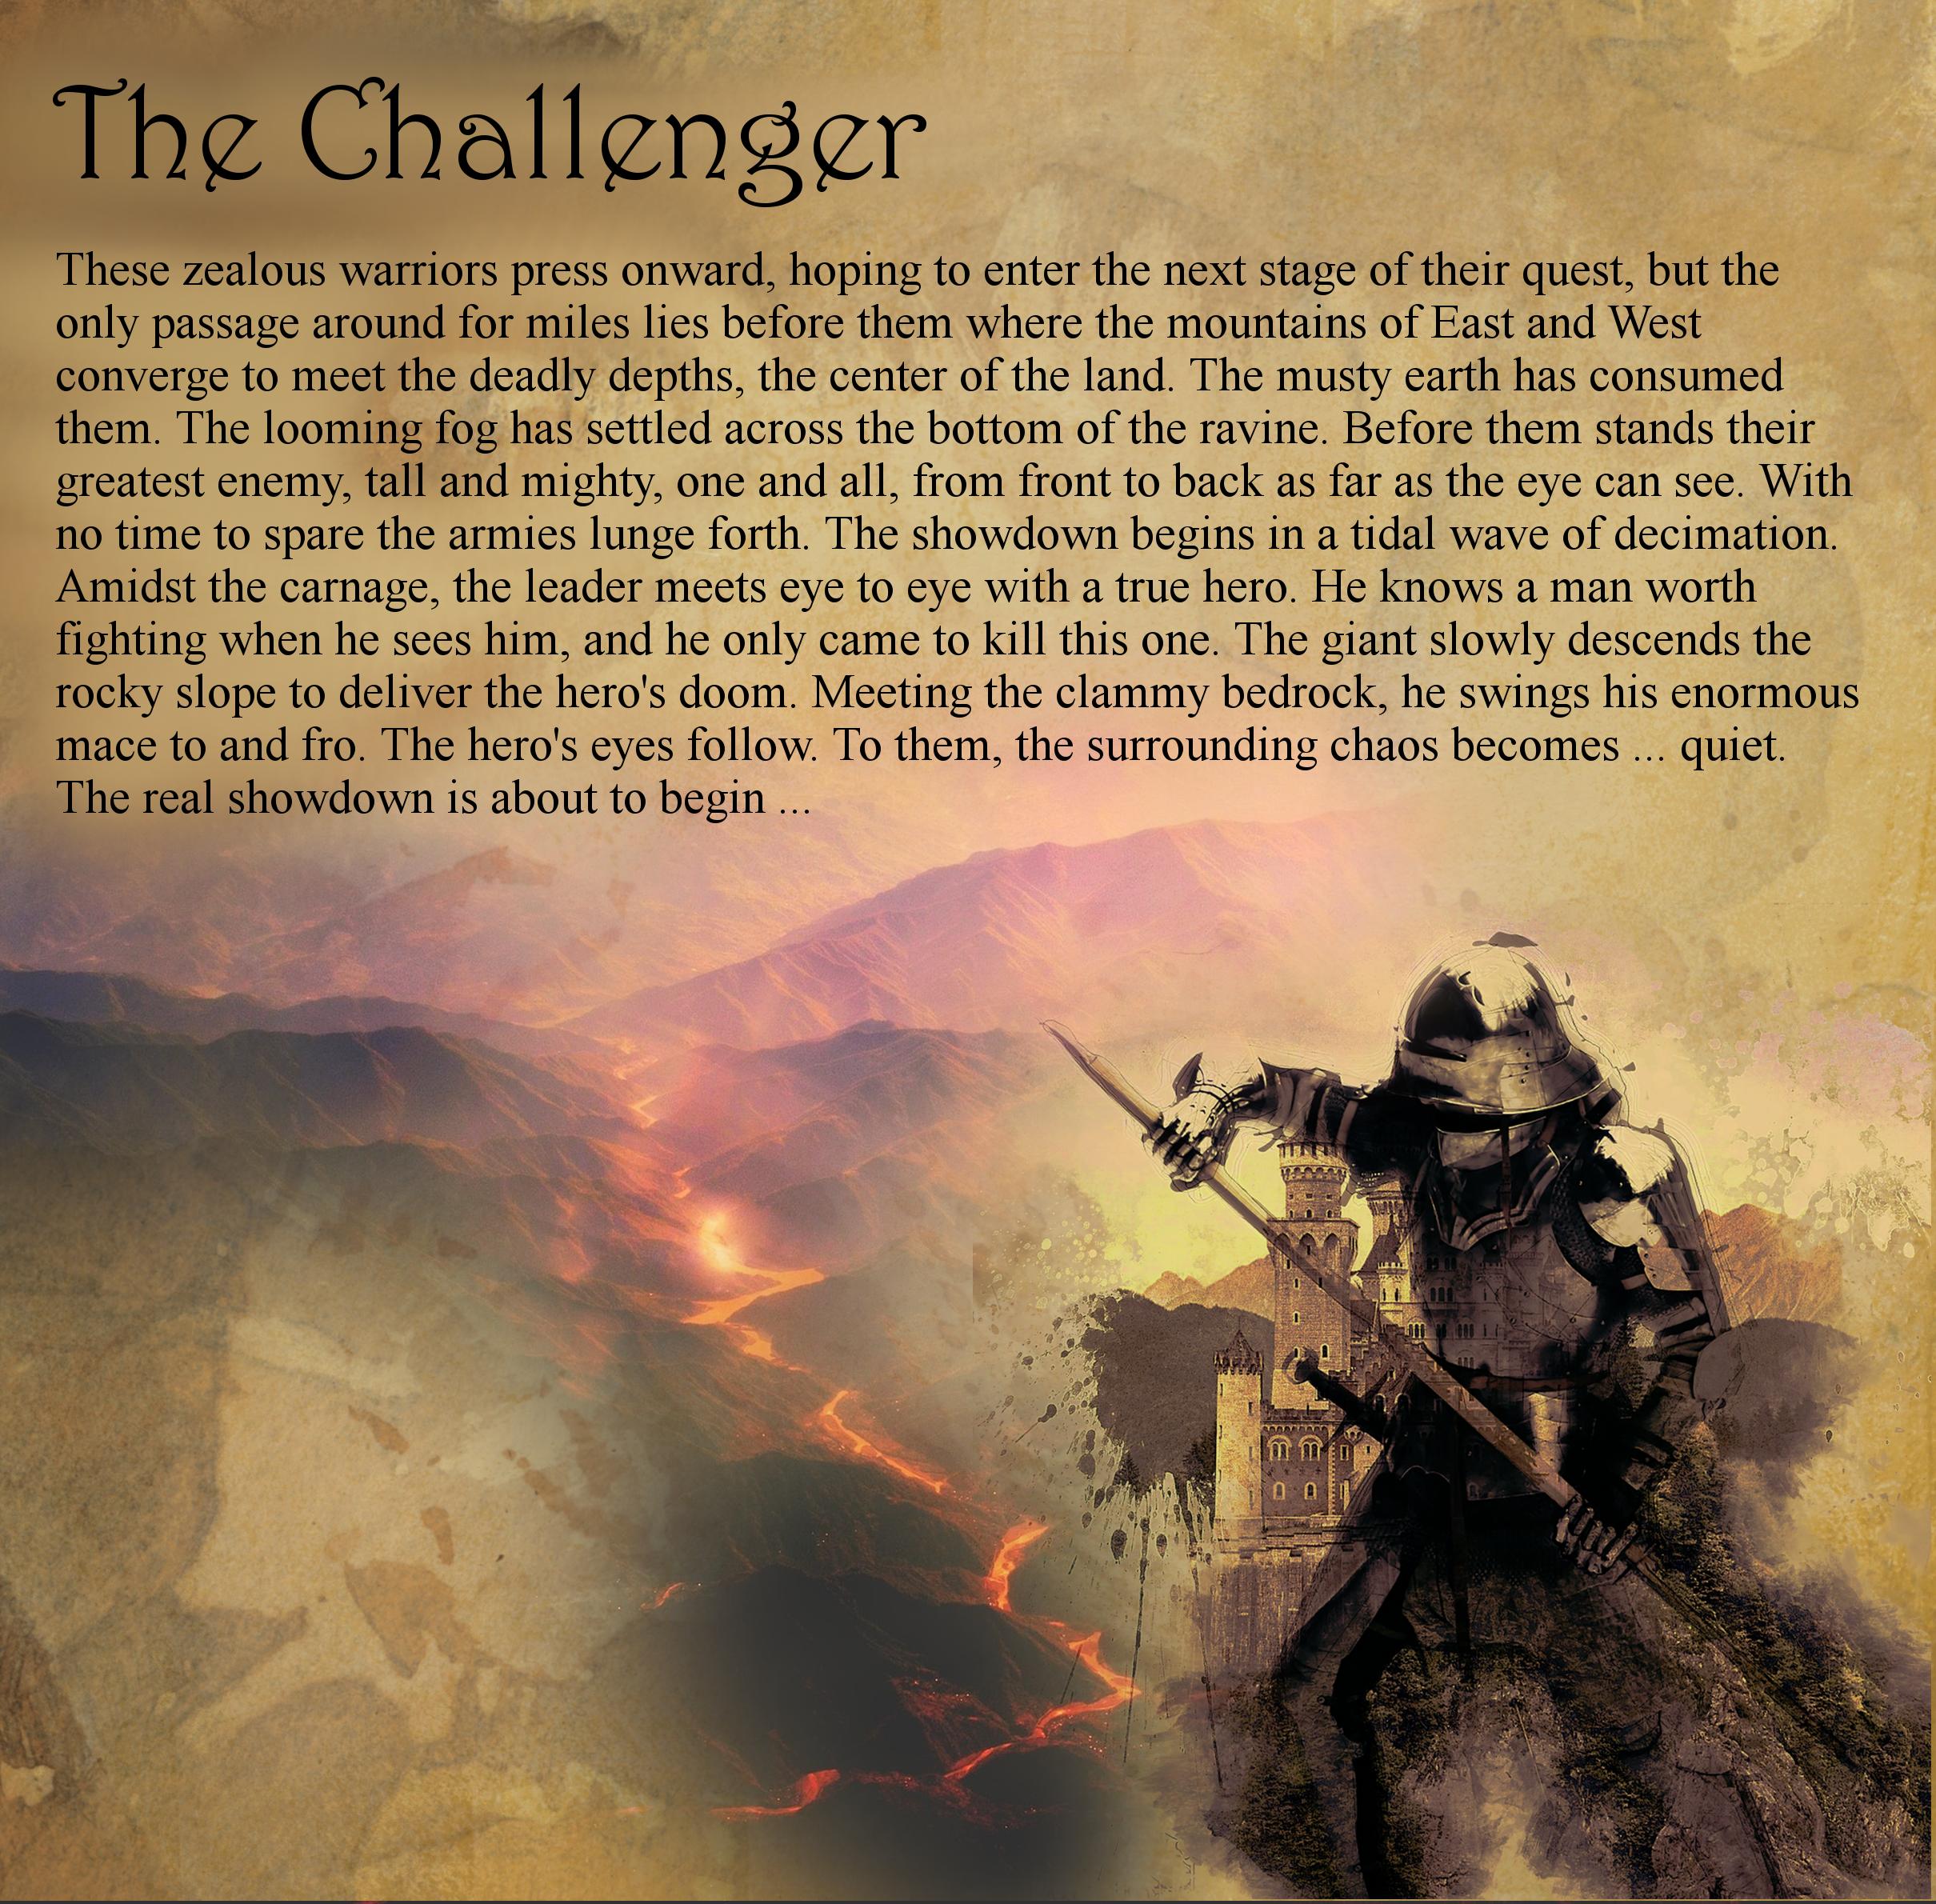 The Challenger Insert